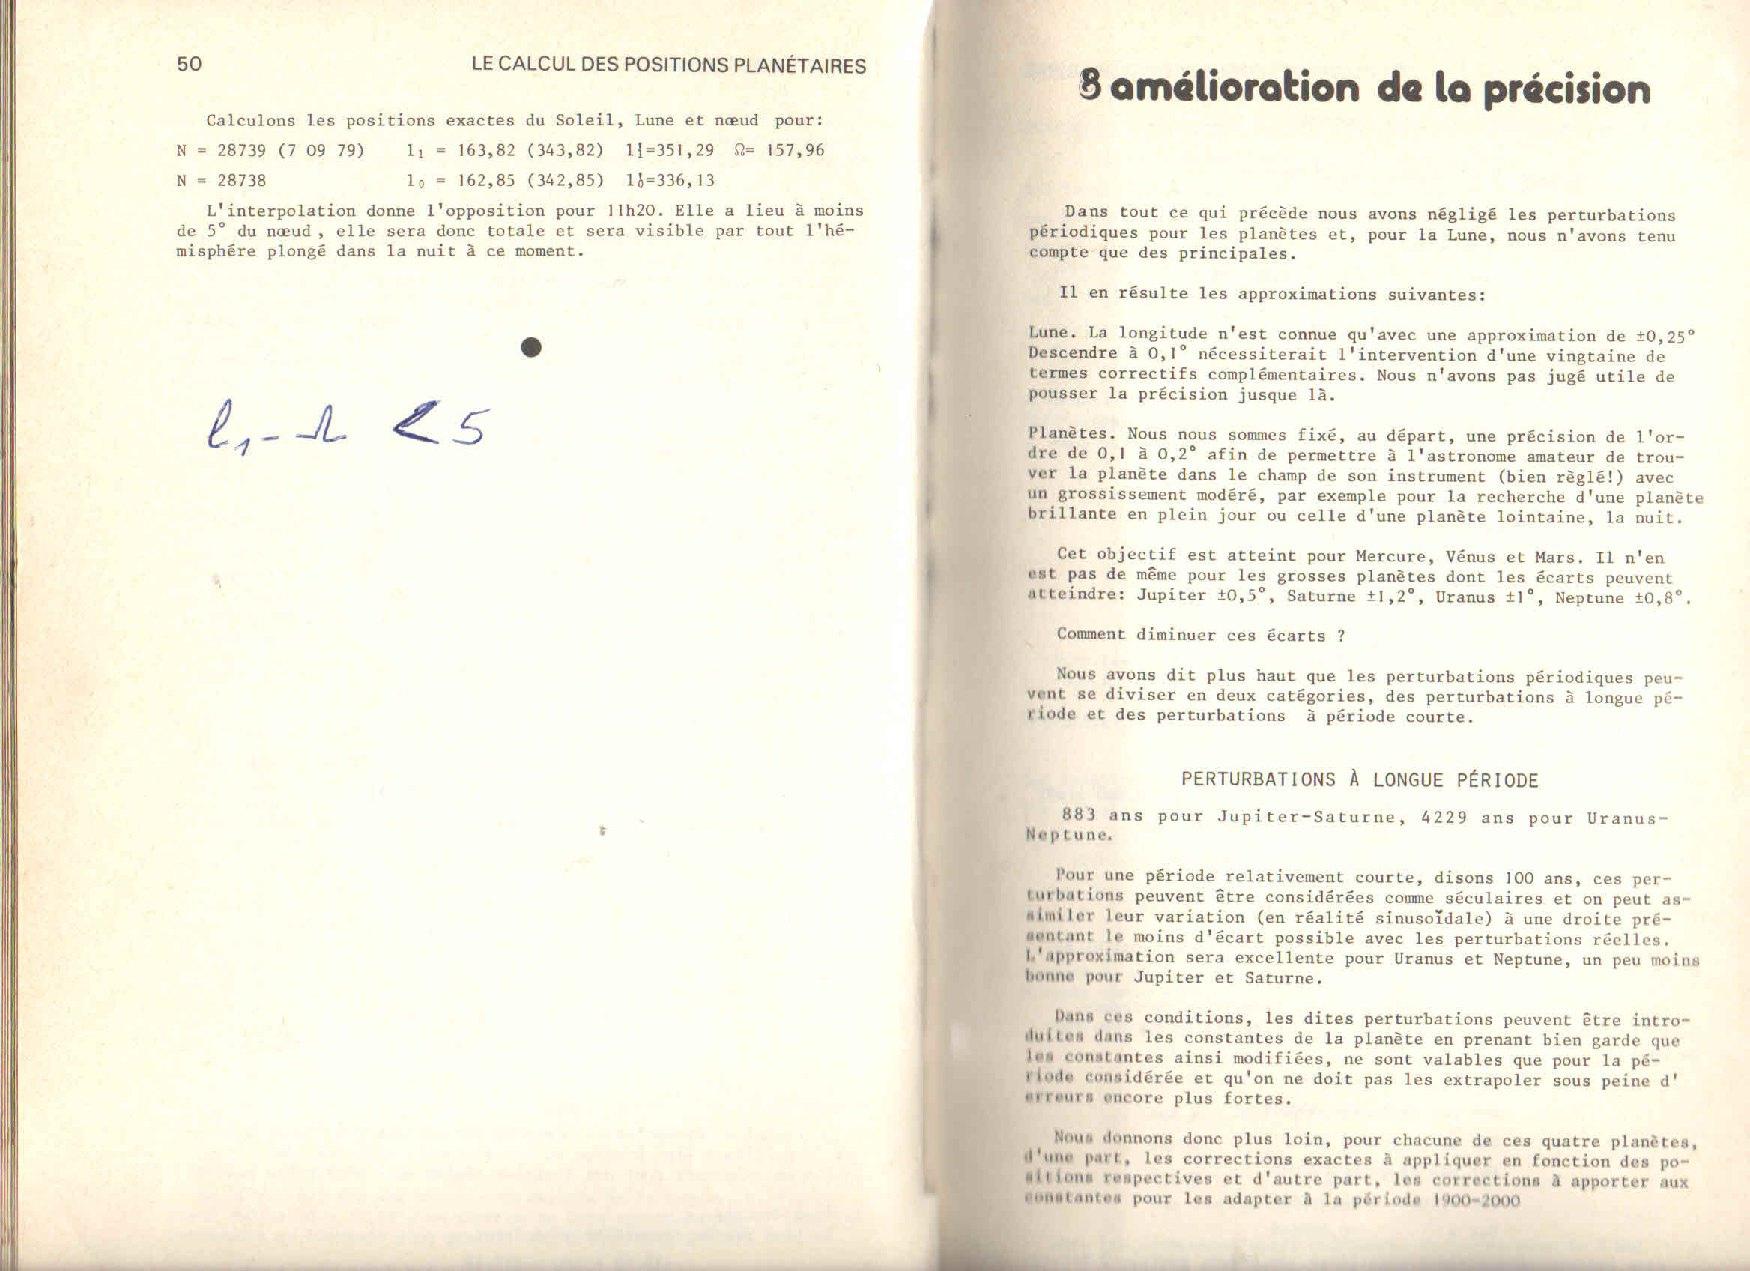 Bouiges3_1980b.jpg